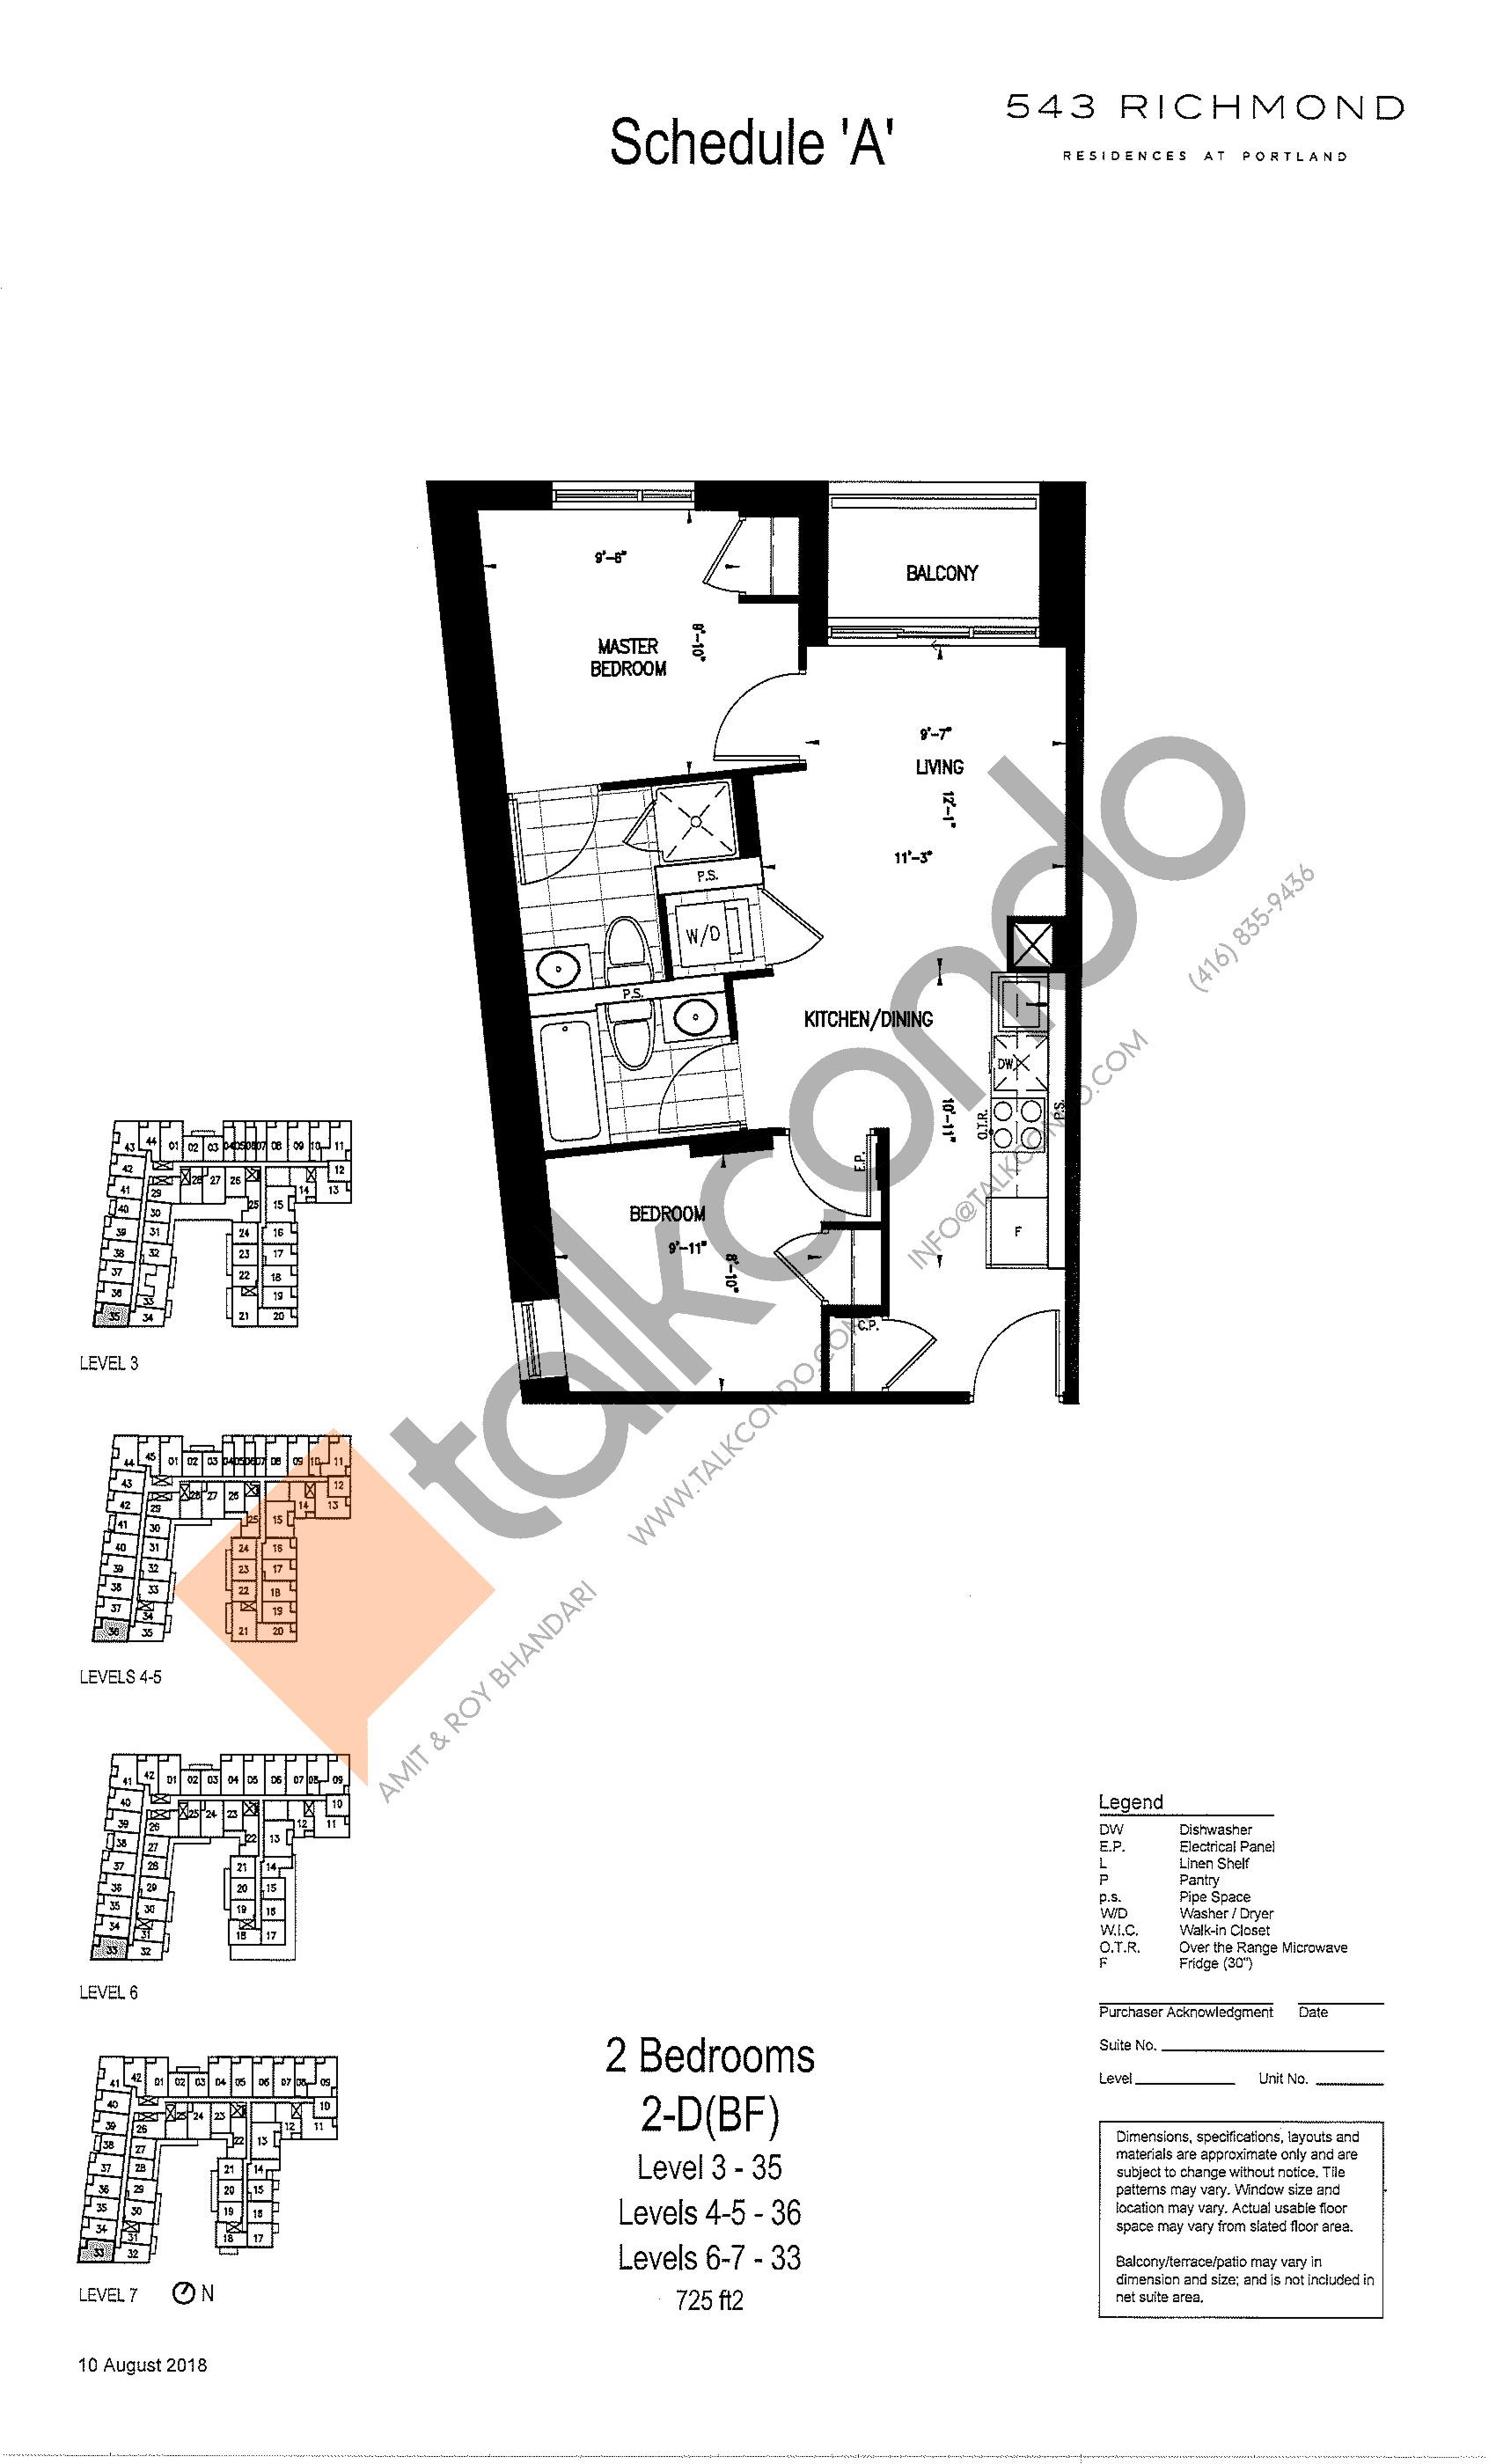 2-D(BF) Floor Plan at 543 Richmond St Condos - 725 sq.ft